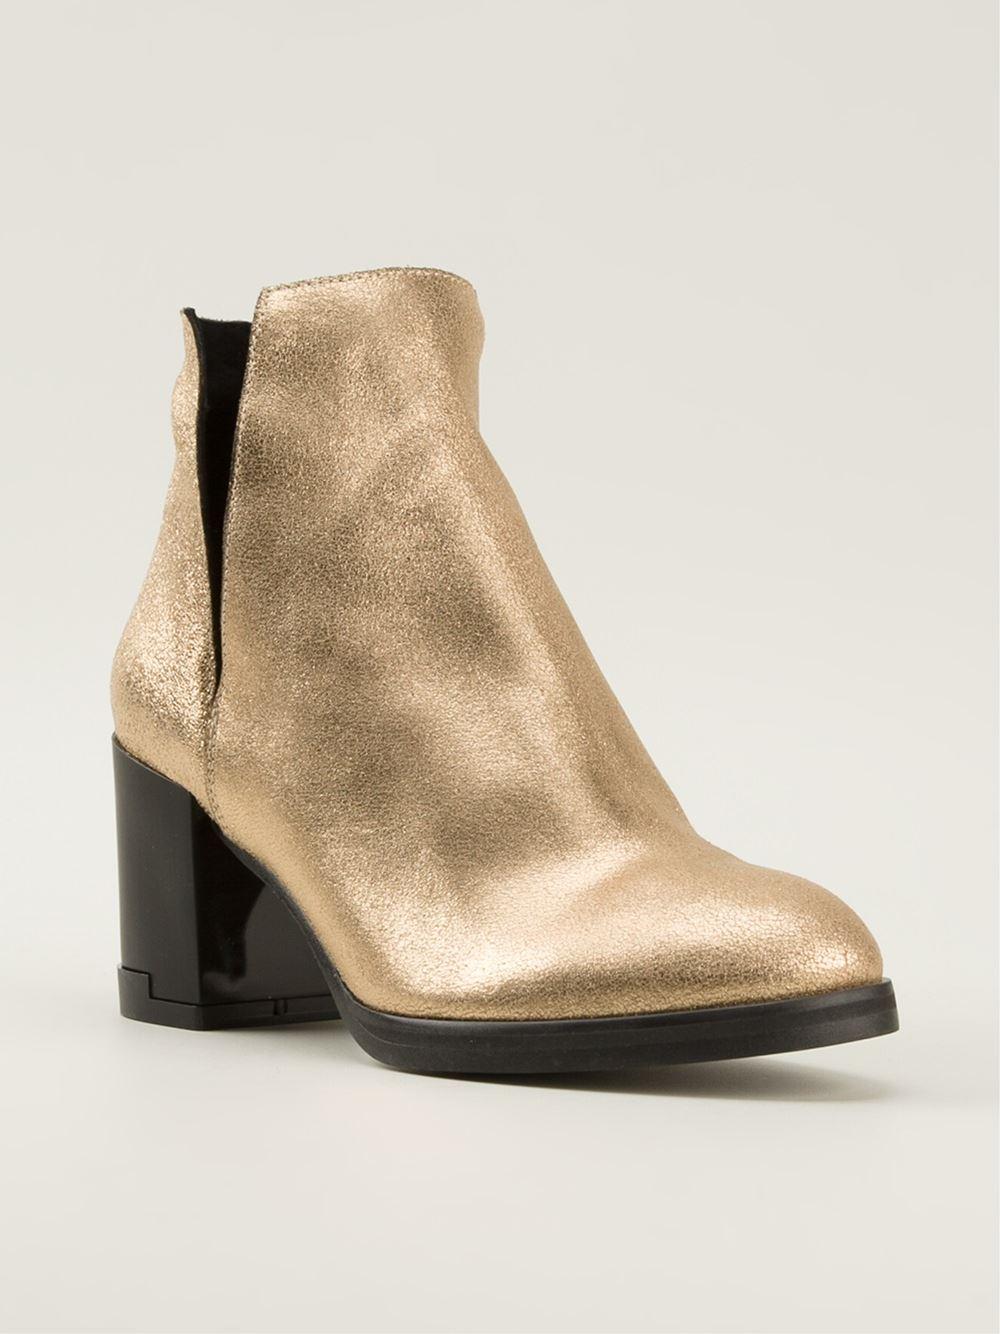 Miista 'Lena' Heeled Ankle Boots in Metallic | Lyst